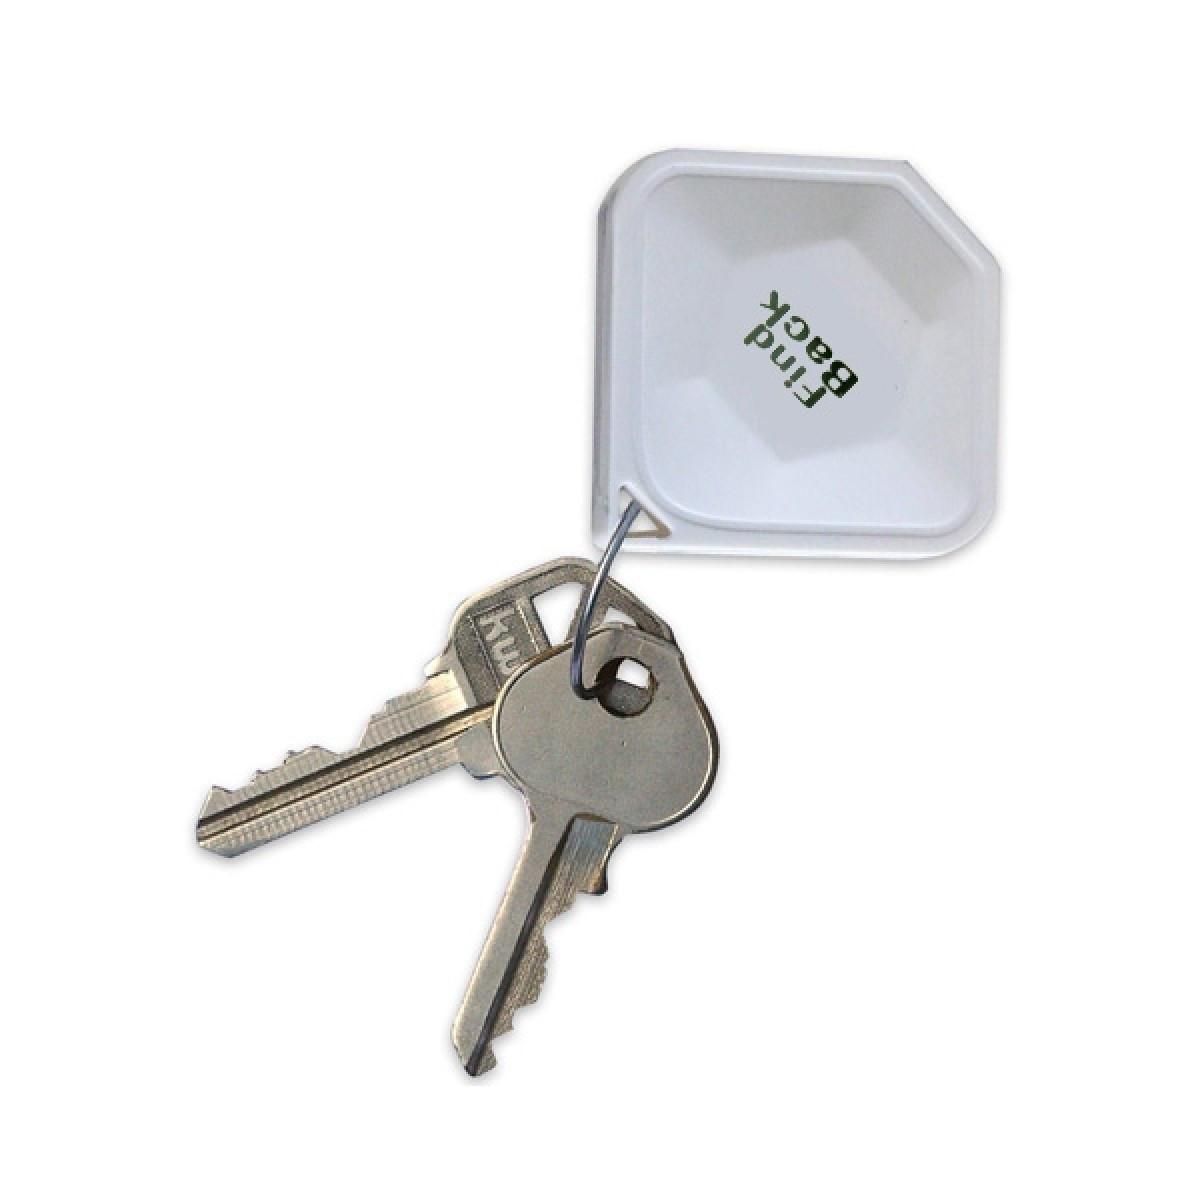 ADENKI FIND BACK QL-603 Брелок для поиска ключей